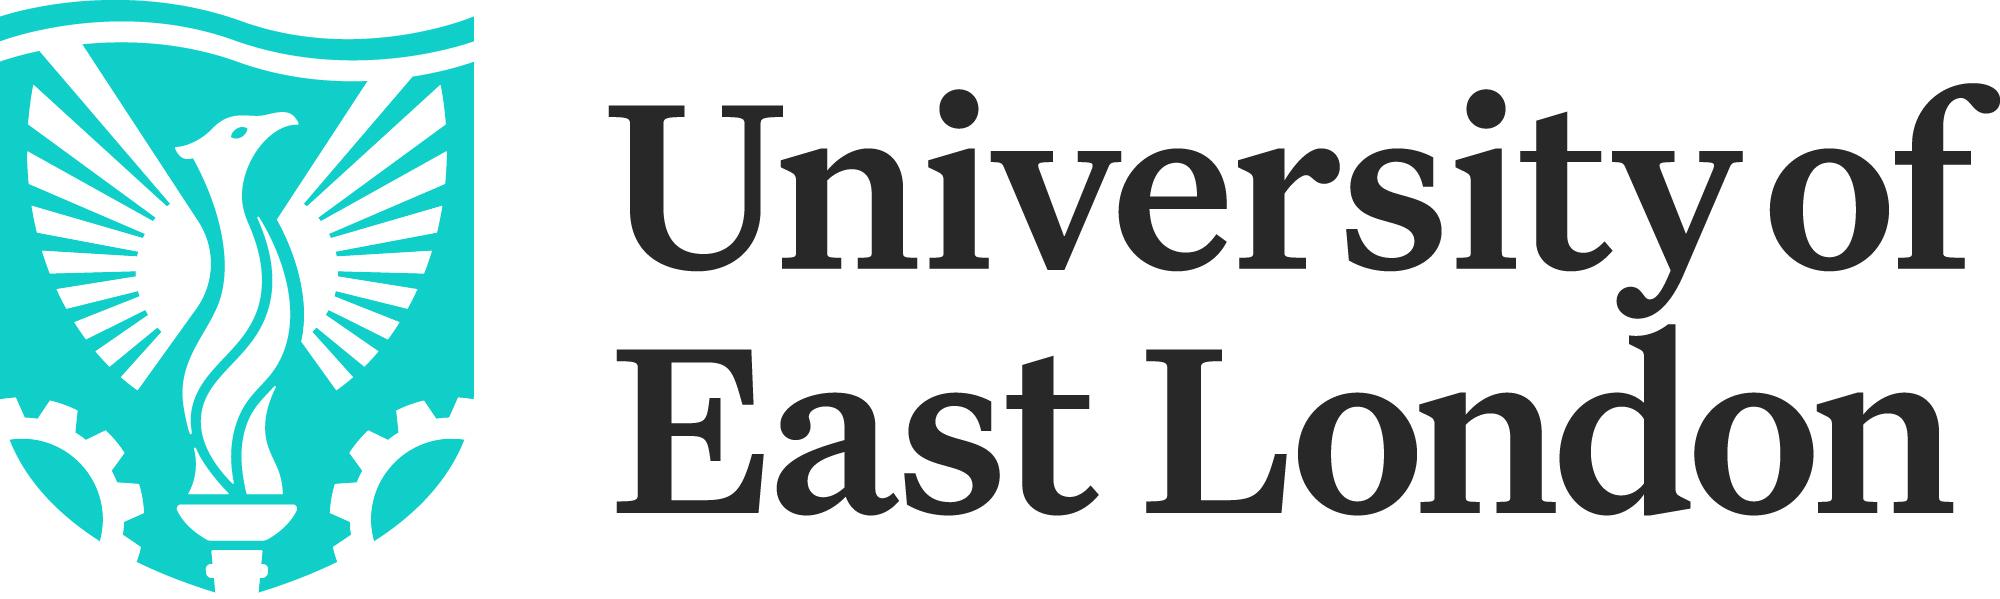 UEL Master Logo RGB White2000.jpg